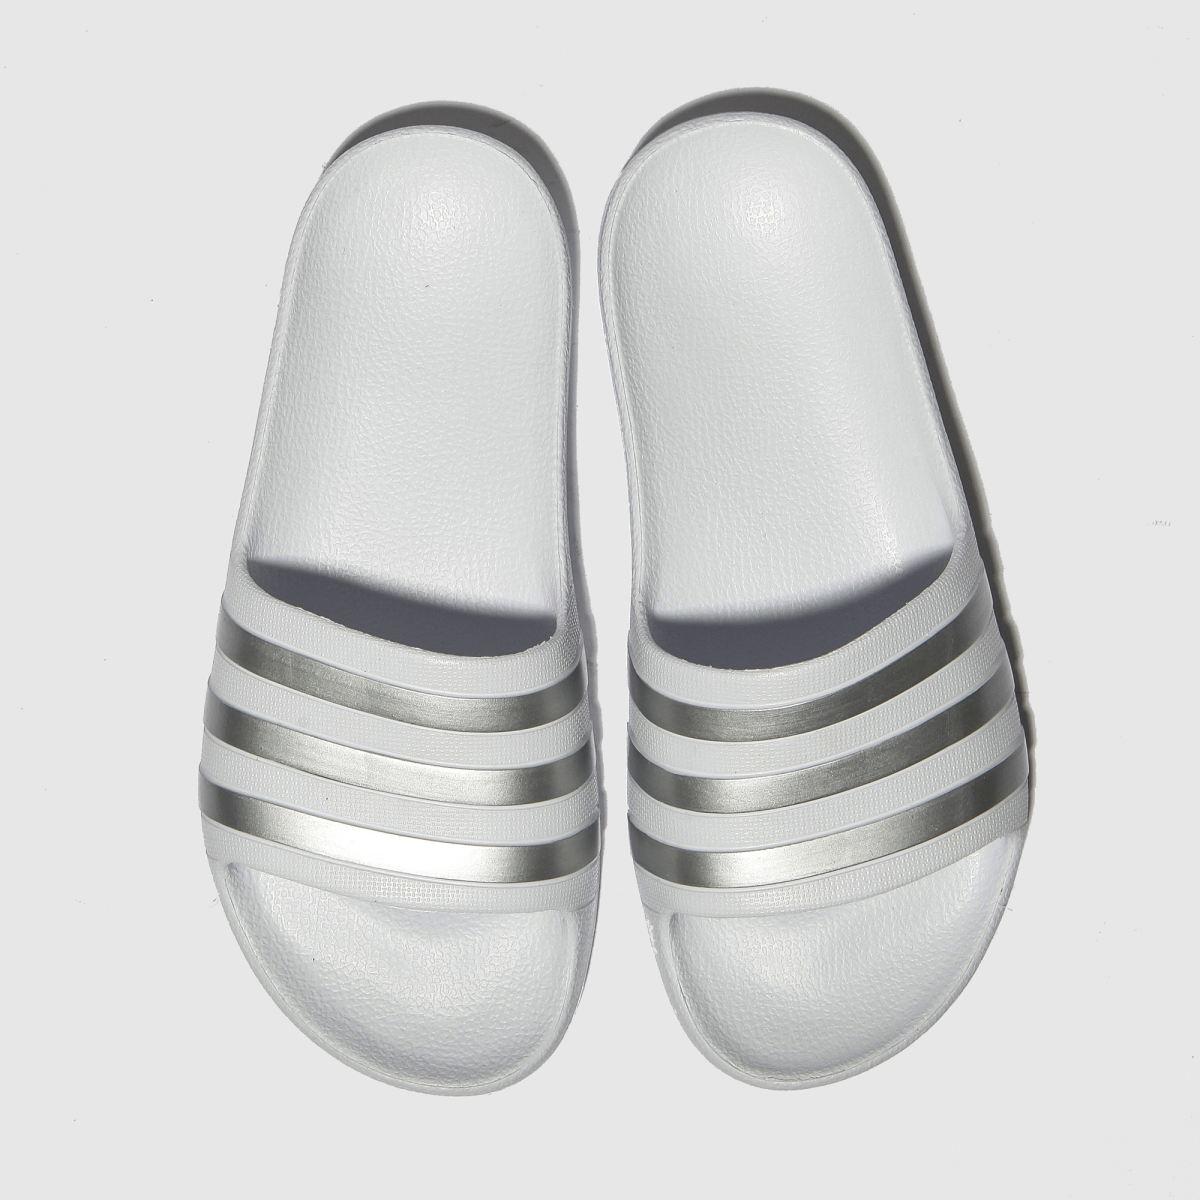 Adidas White & Silver Adilette Aqua Trainers Junior